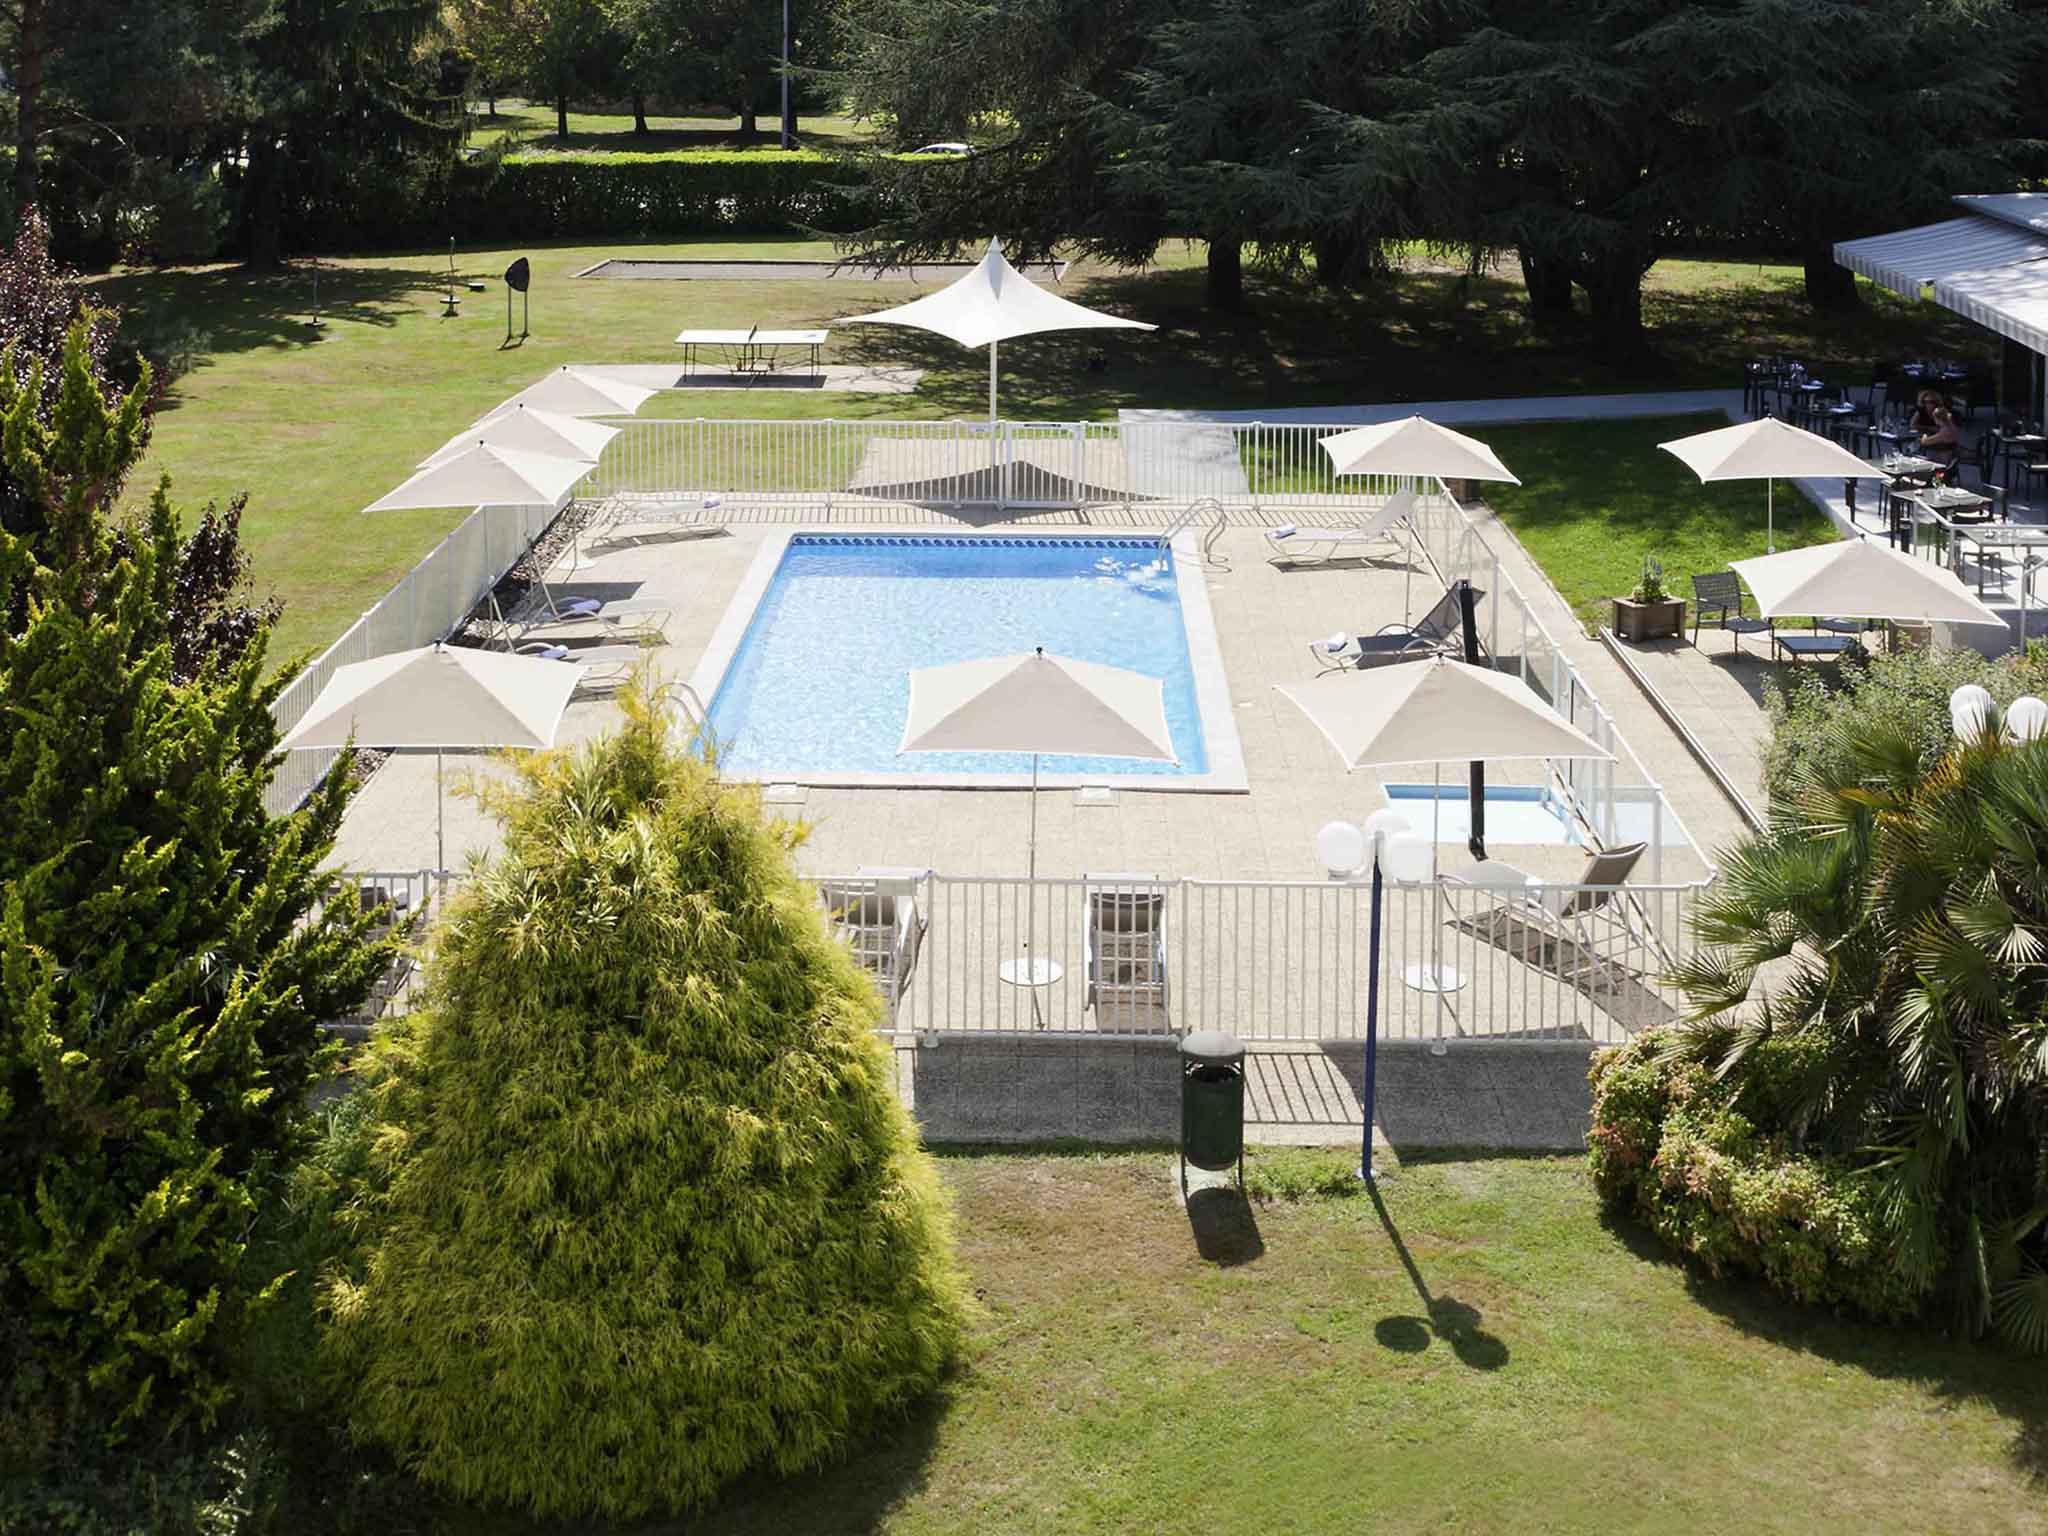 Novotel Pau Pyrenees Hotel